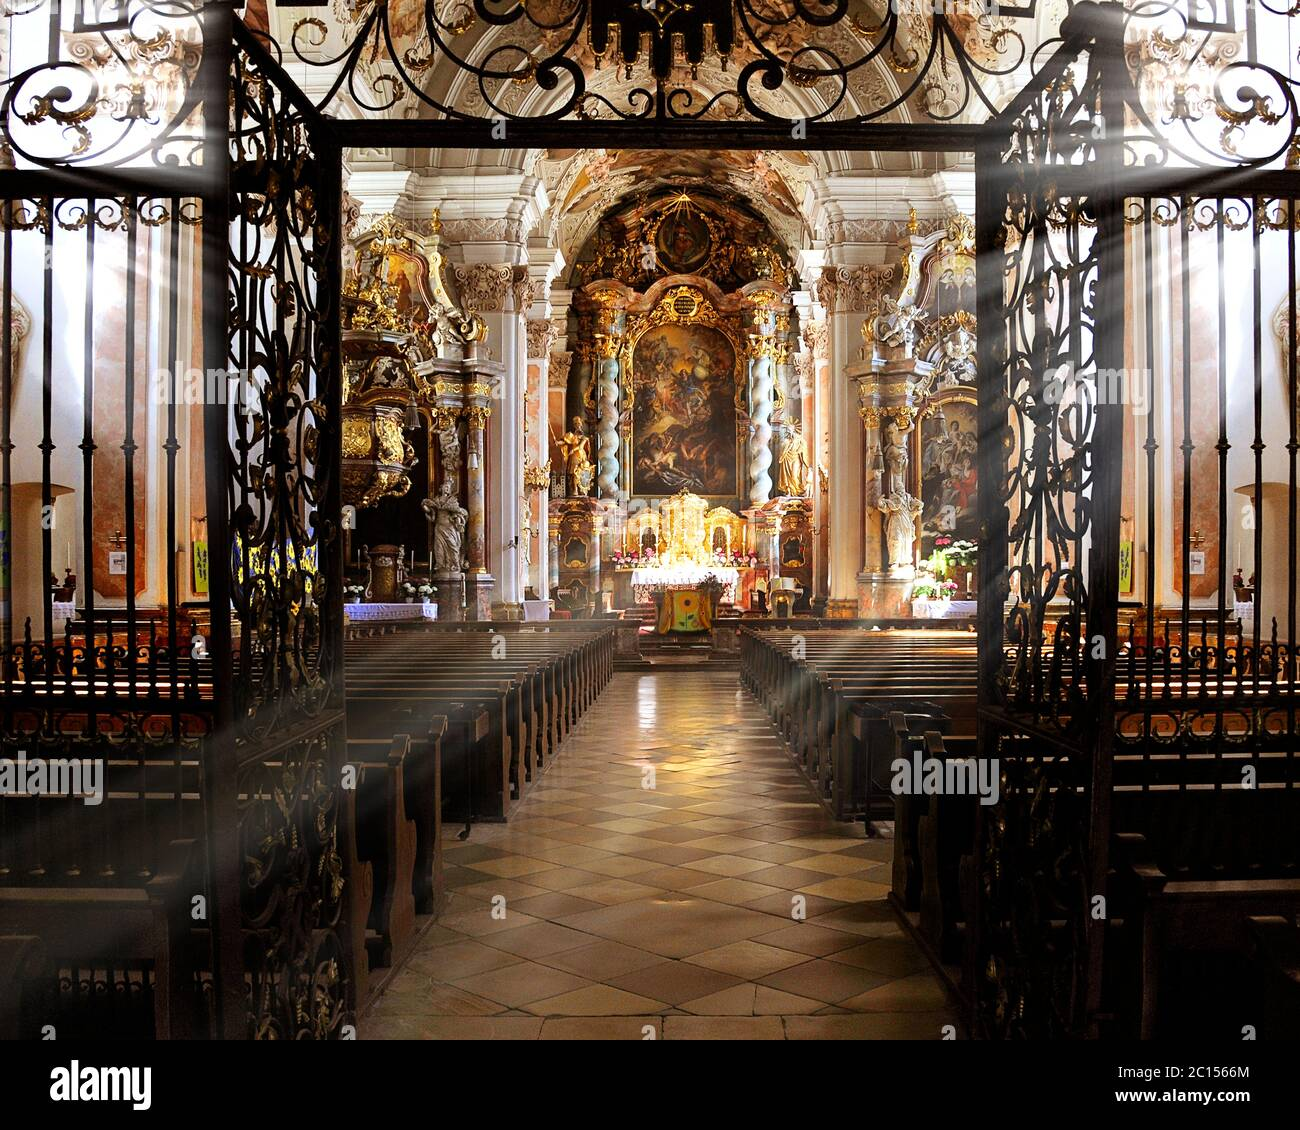 DE - LOWER BAVARIA: Interior of St. Michael's Klosterkirche at Metten (Benedictine Monastery) Stock Photo